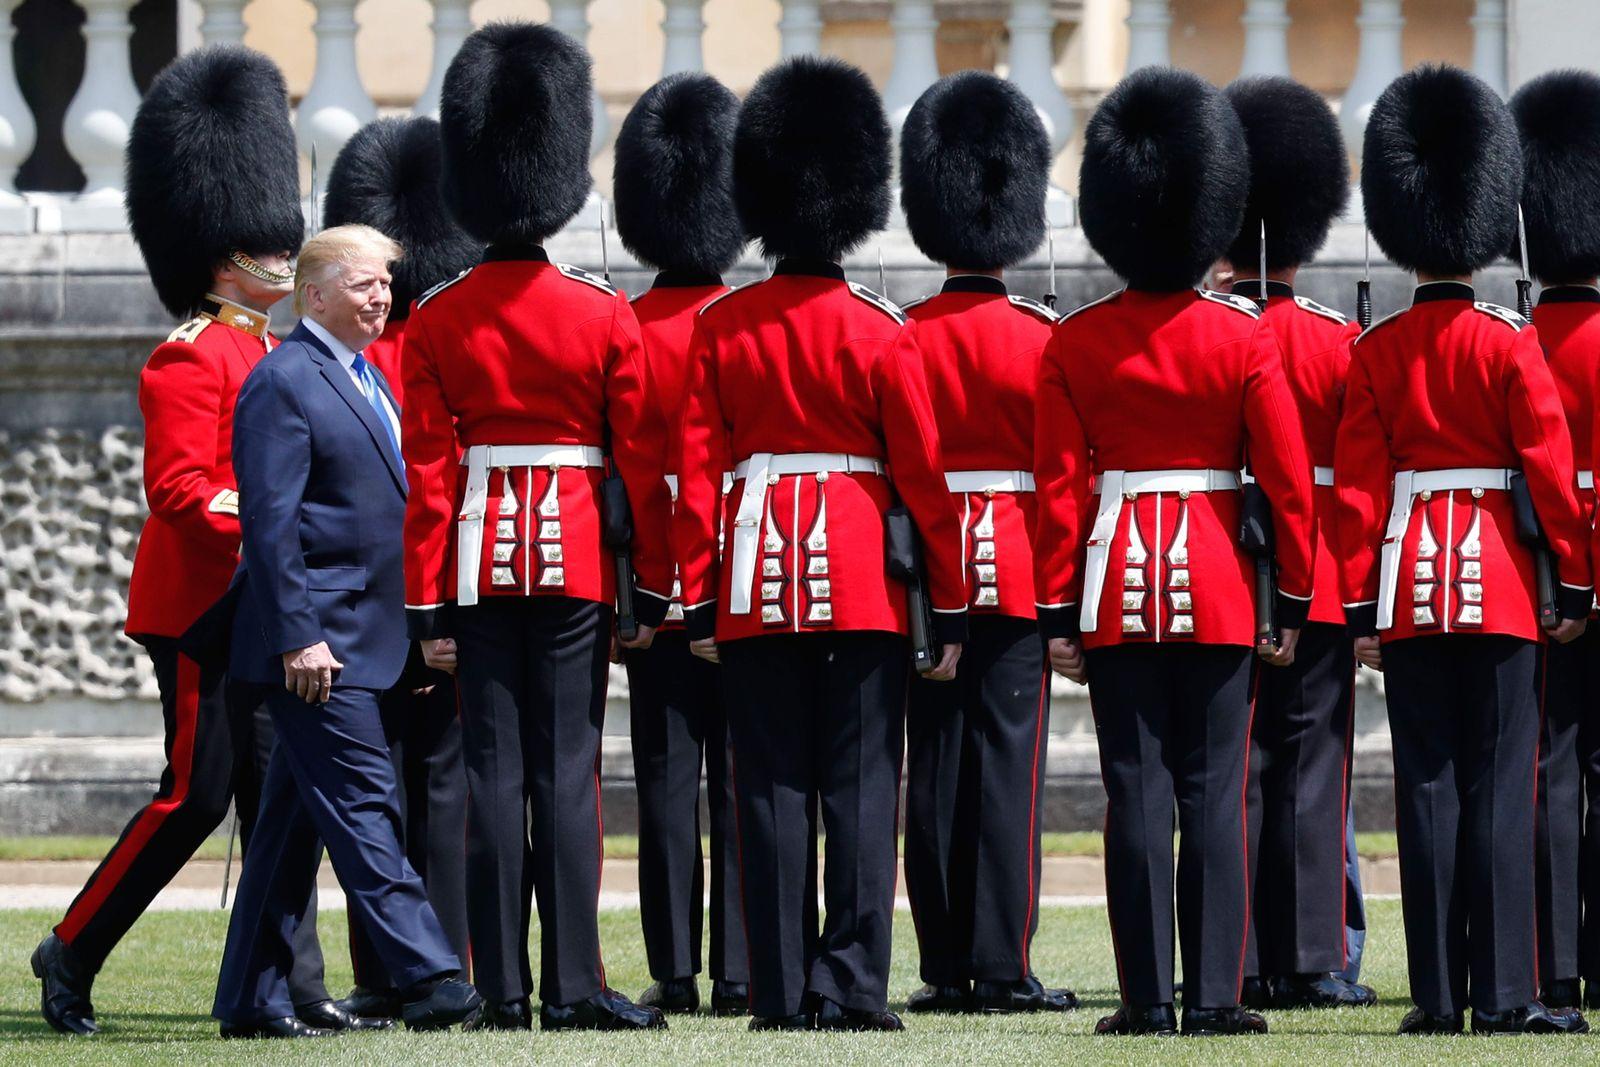 TOPSHOT-BRITAIN-US-POLITICS-DIPLOMACY-ROYALS